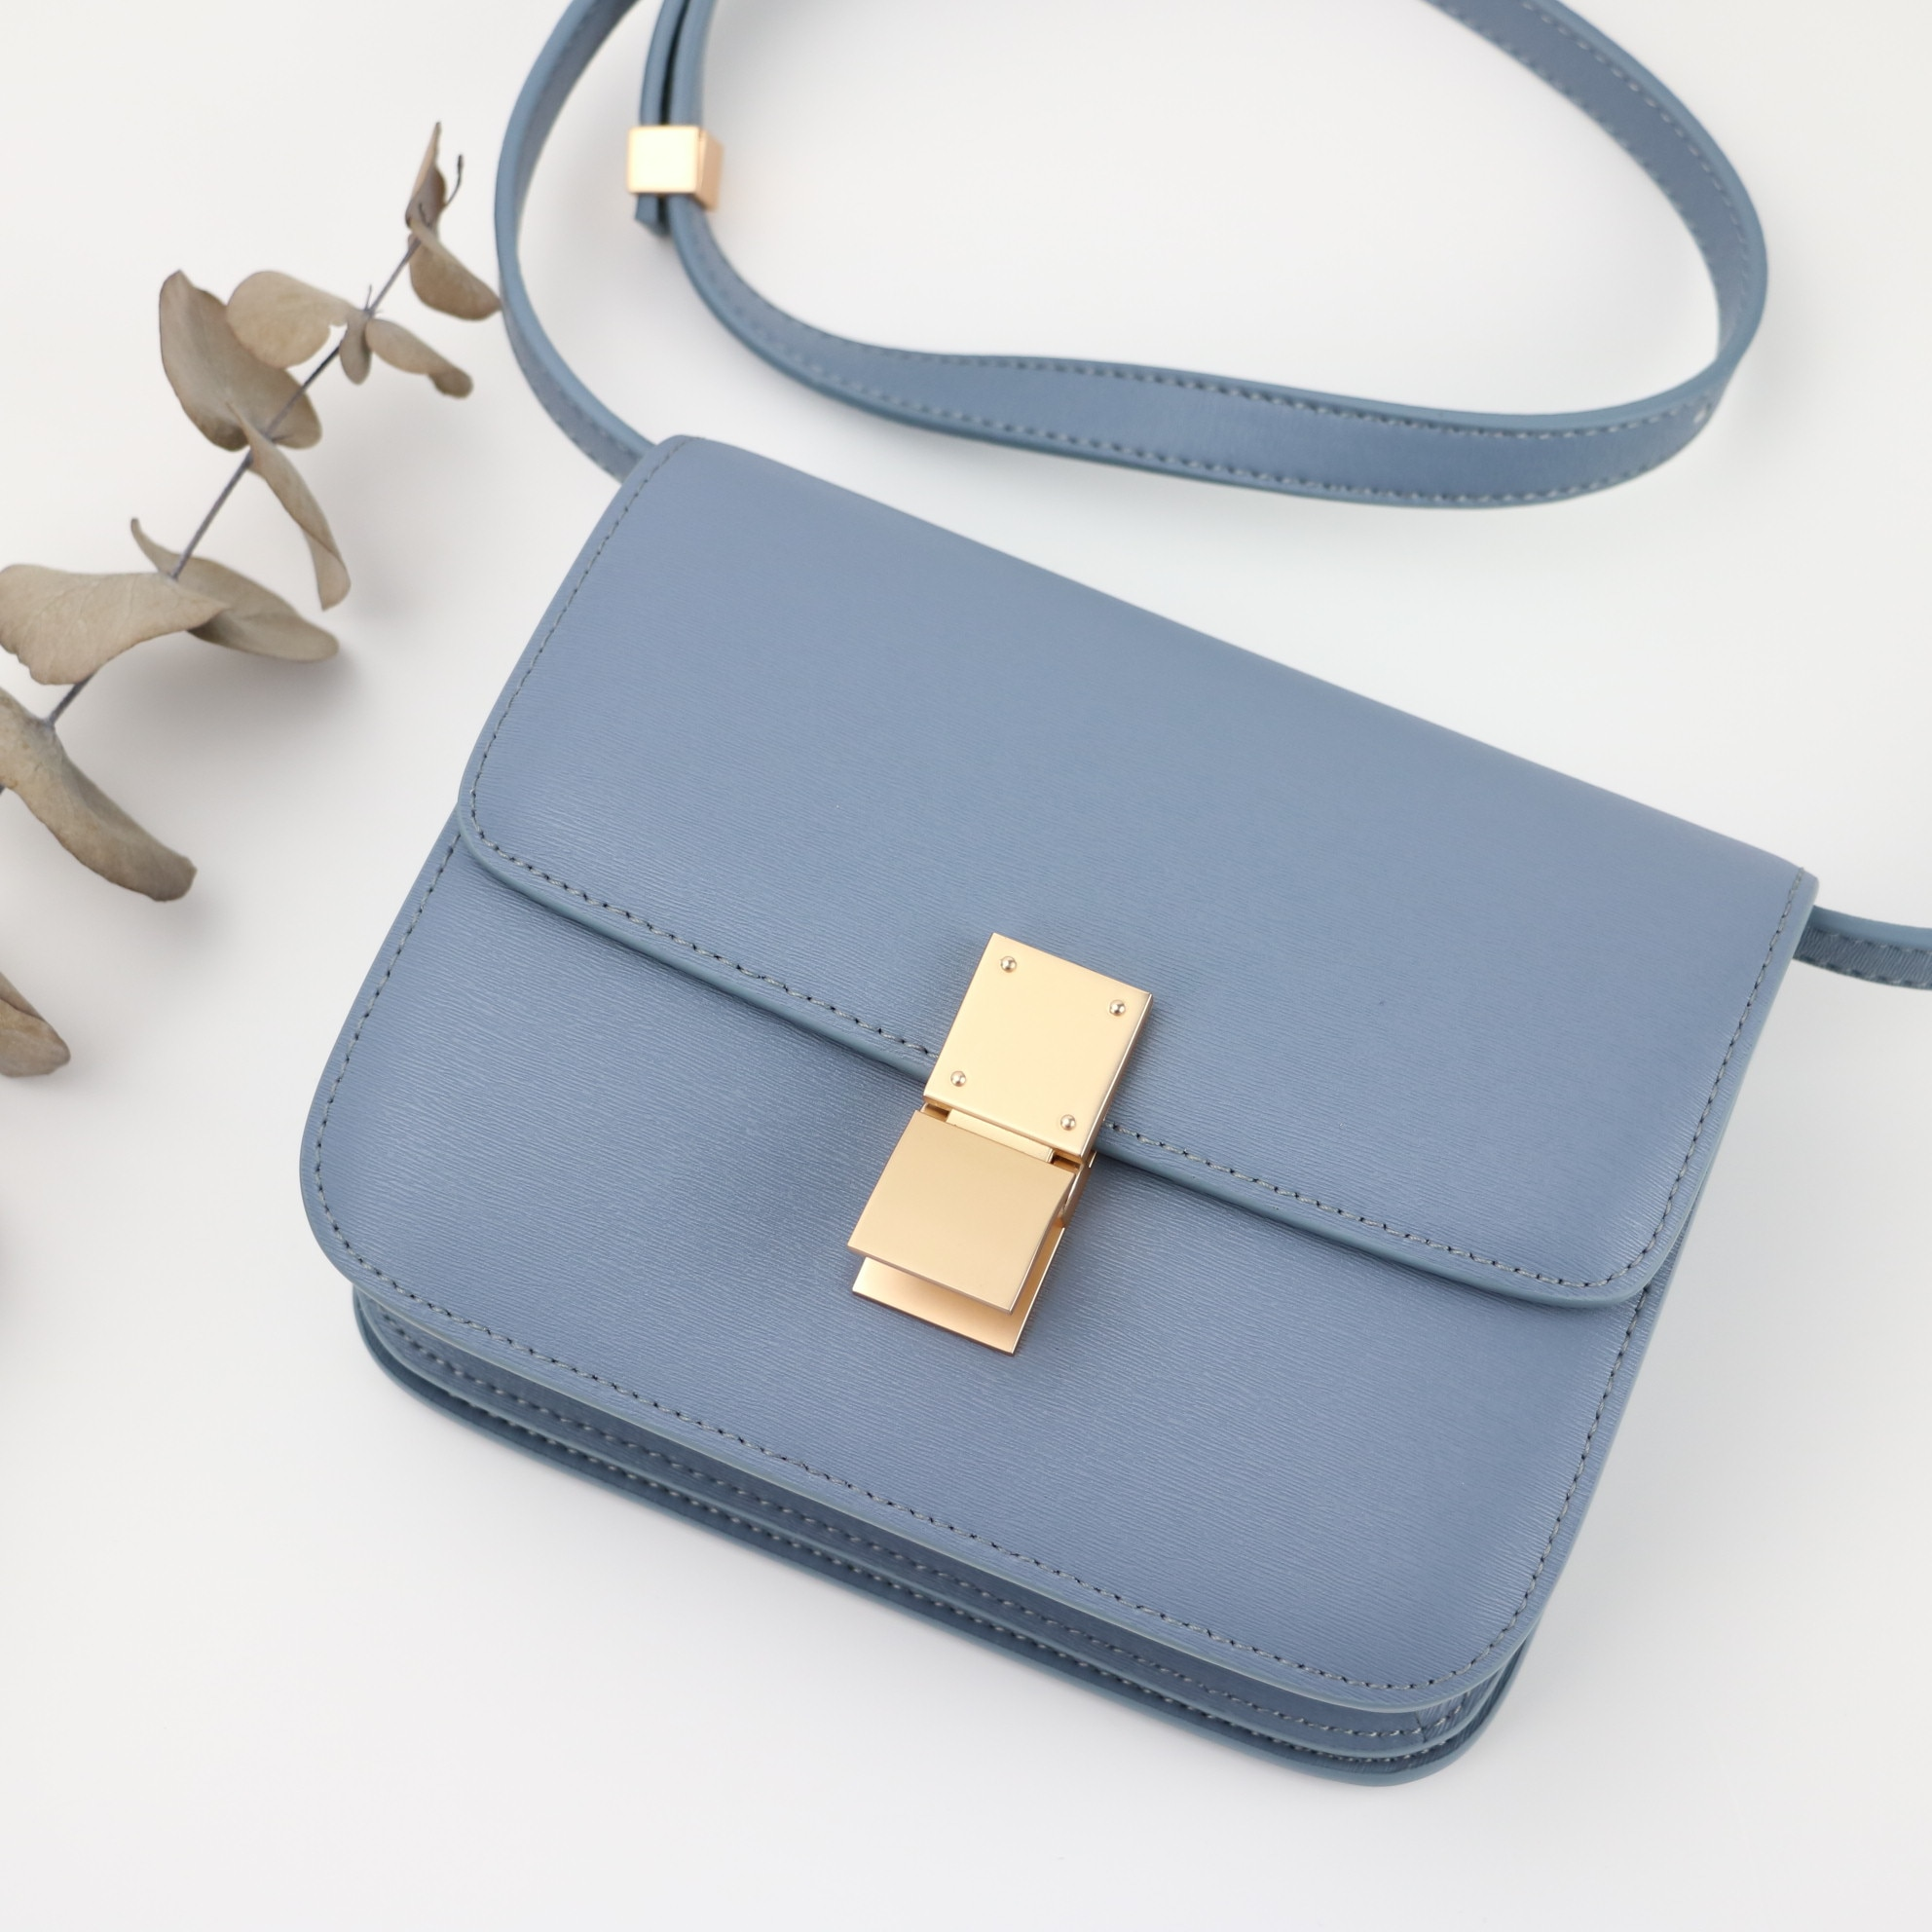 2020 Luxury Design Bag Classic Box Flap Geniune Leather Tofu Bag Square Bag with Lock Women Casual Shoulder Crossbody Bag